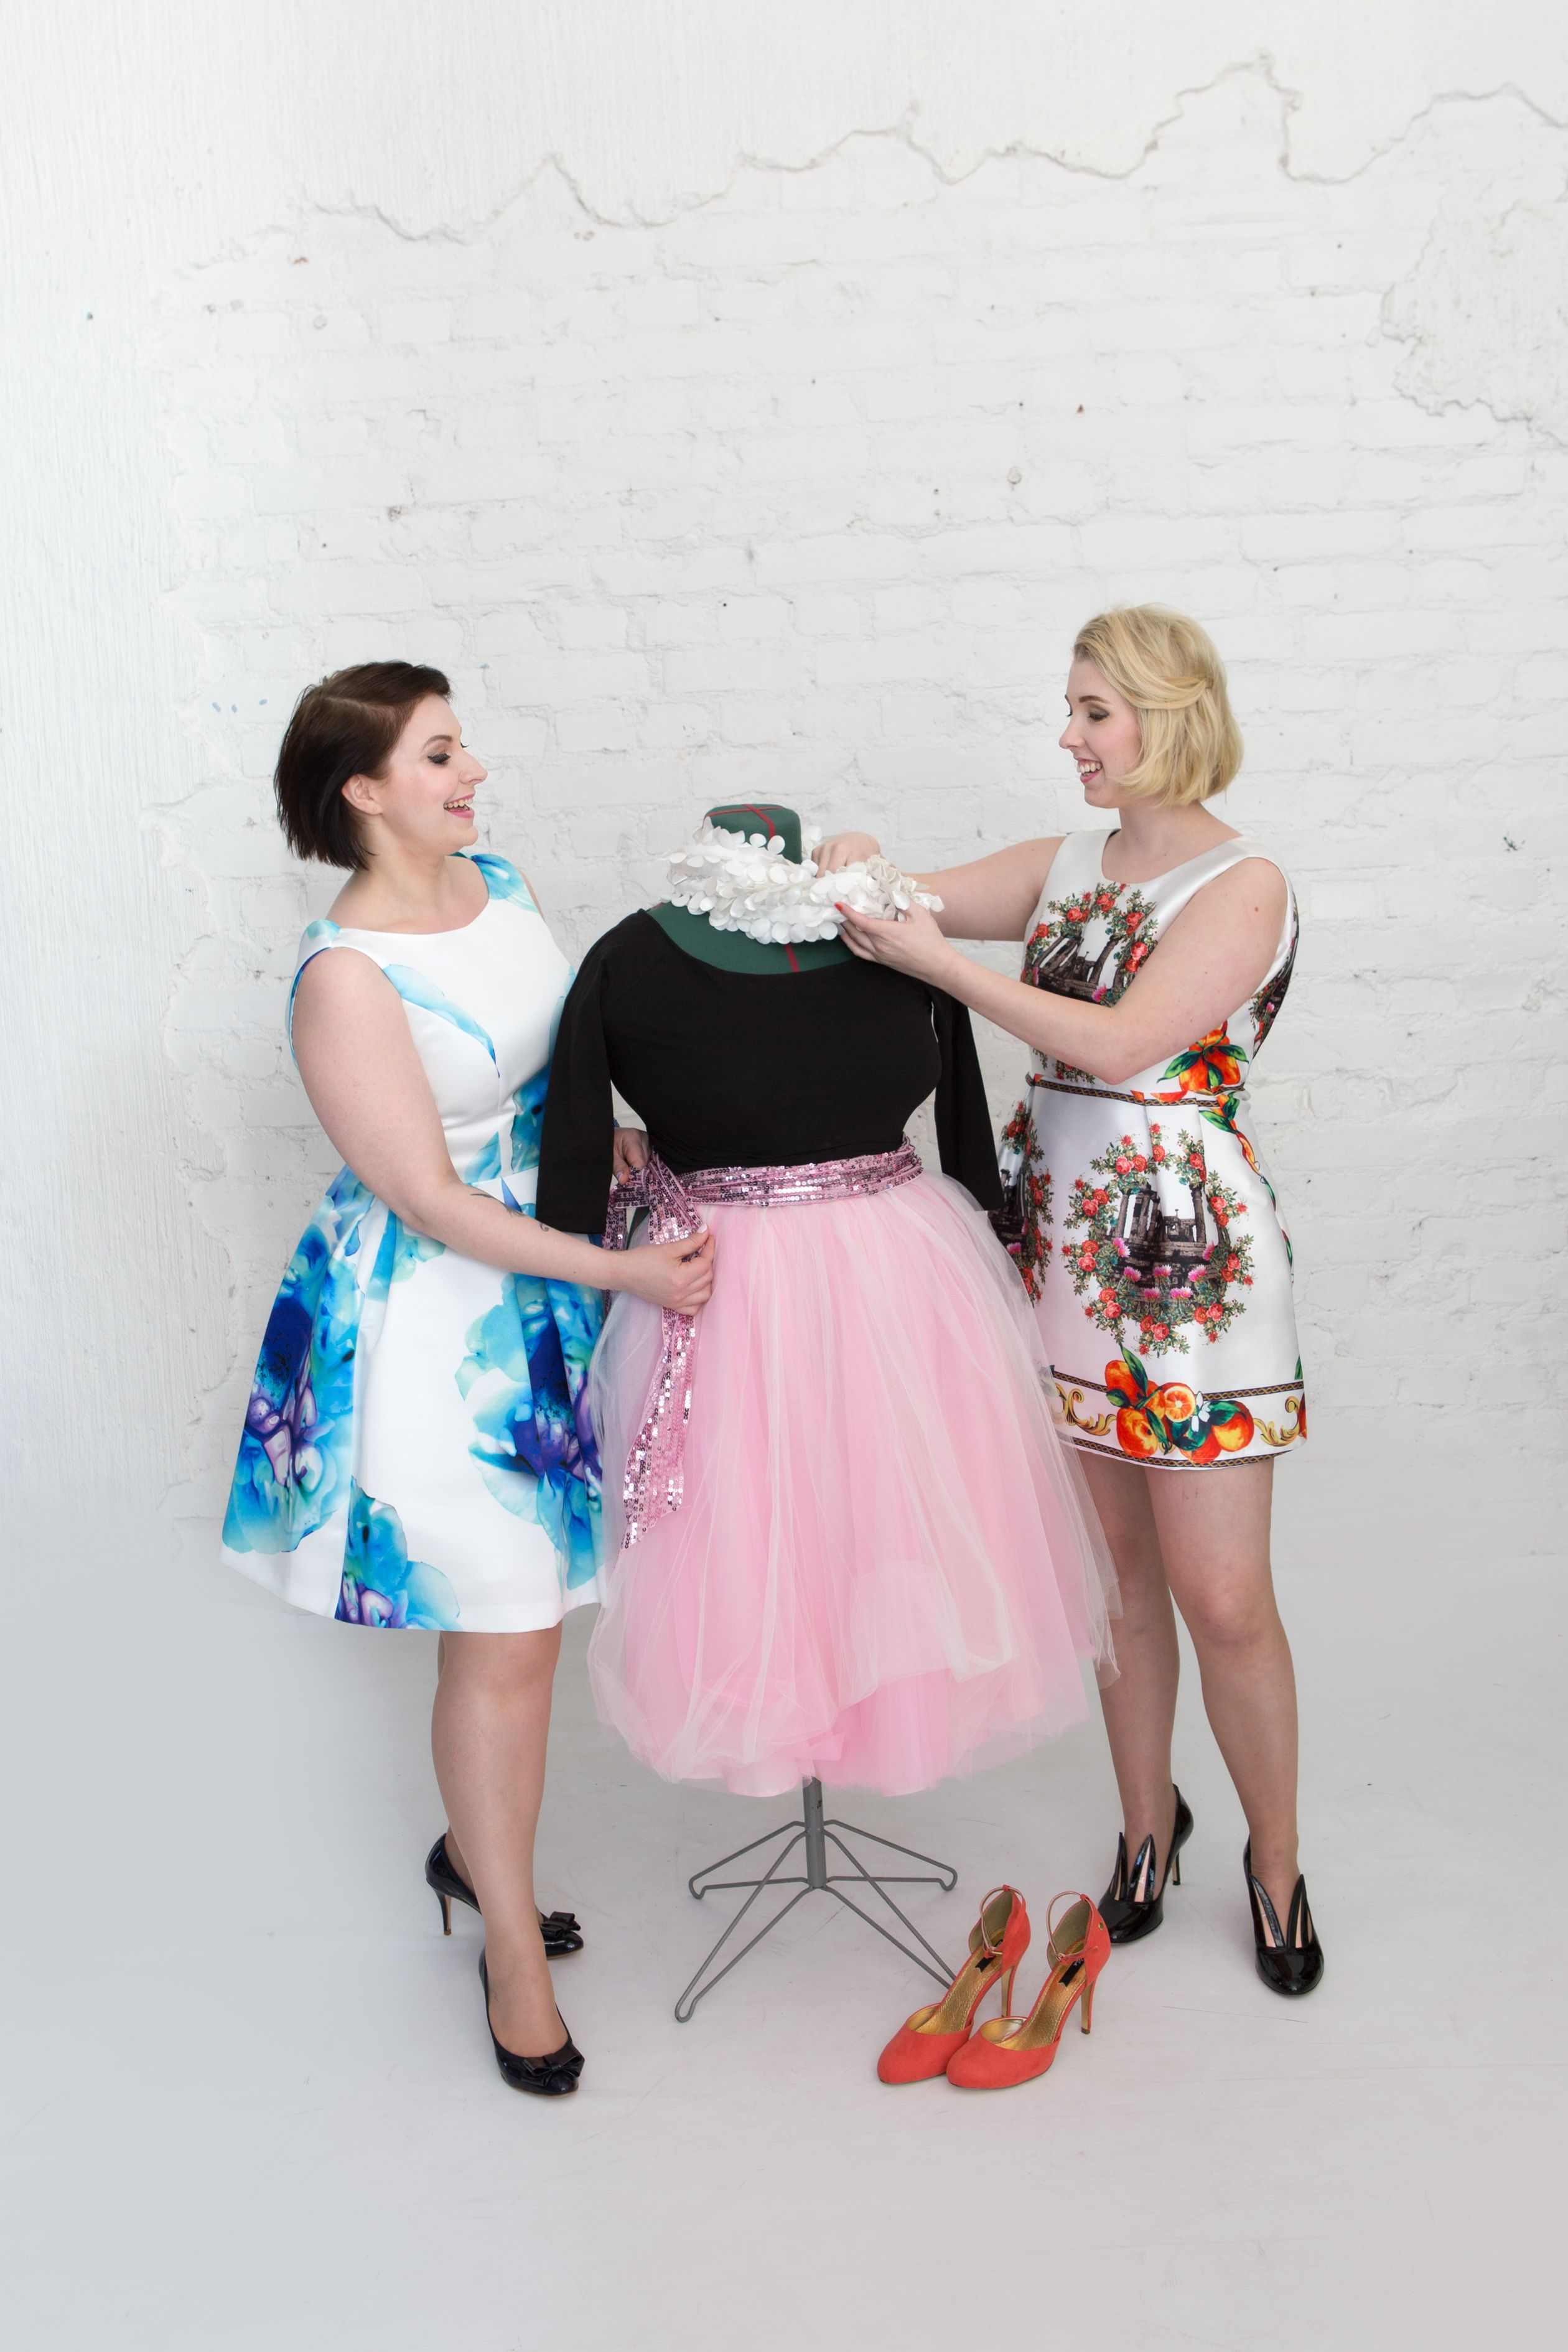 Styling fashion designer